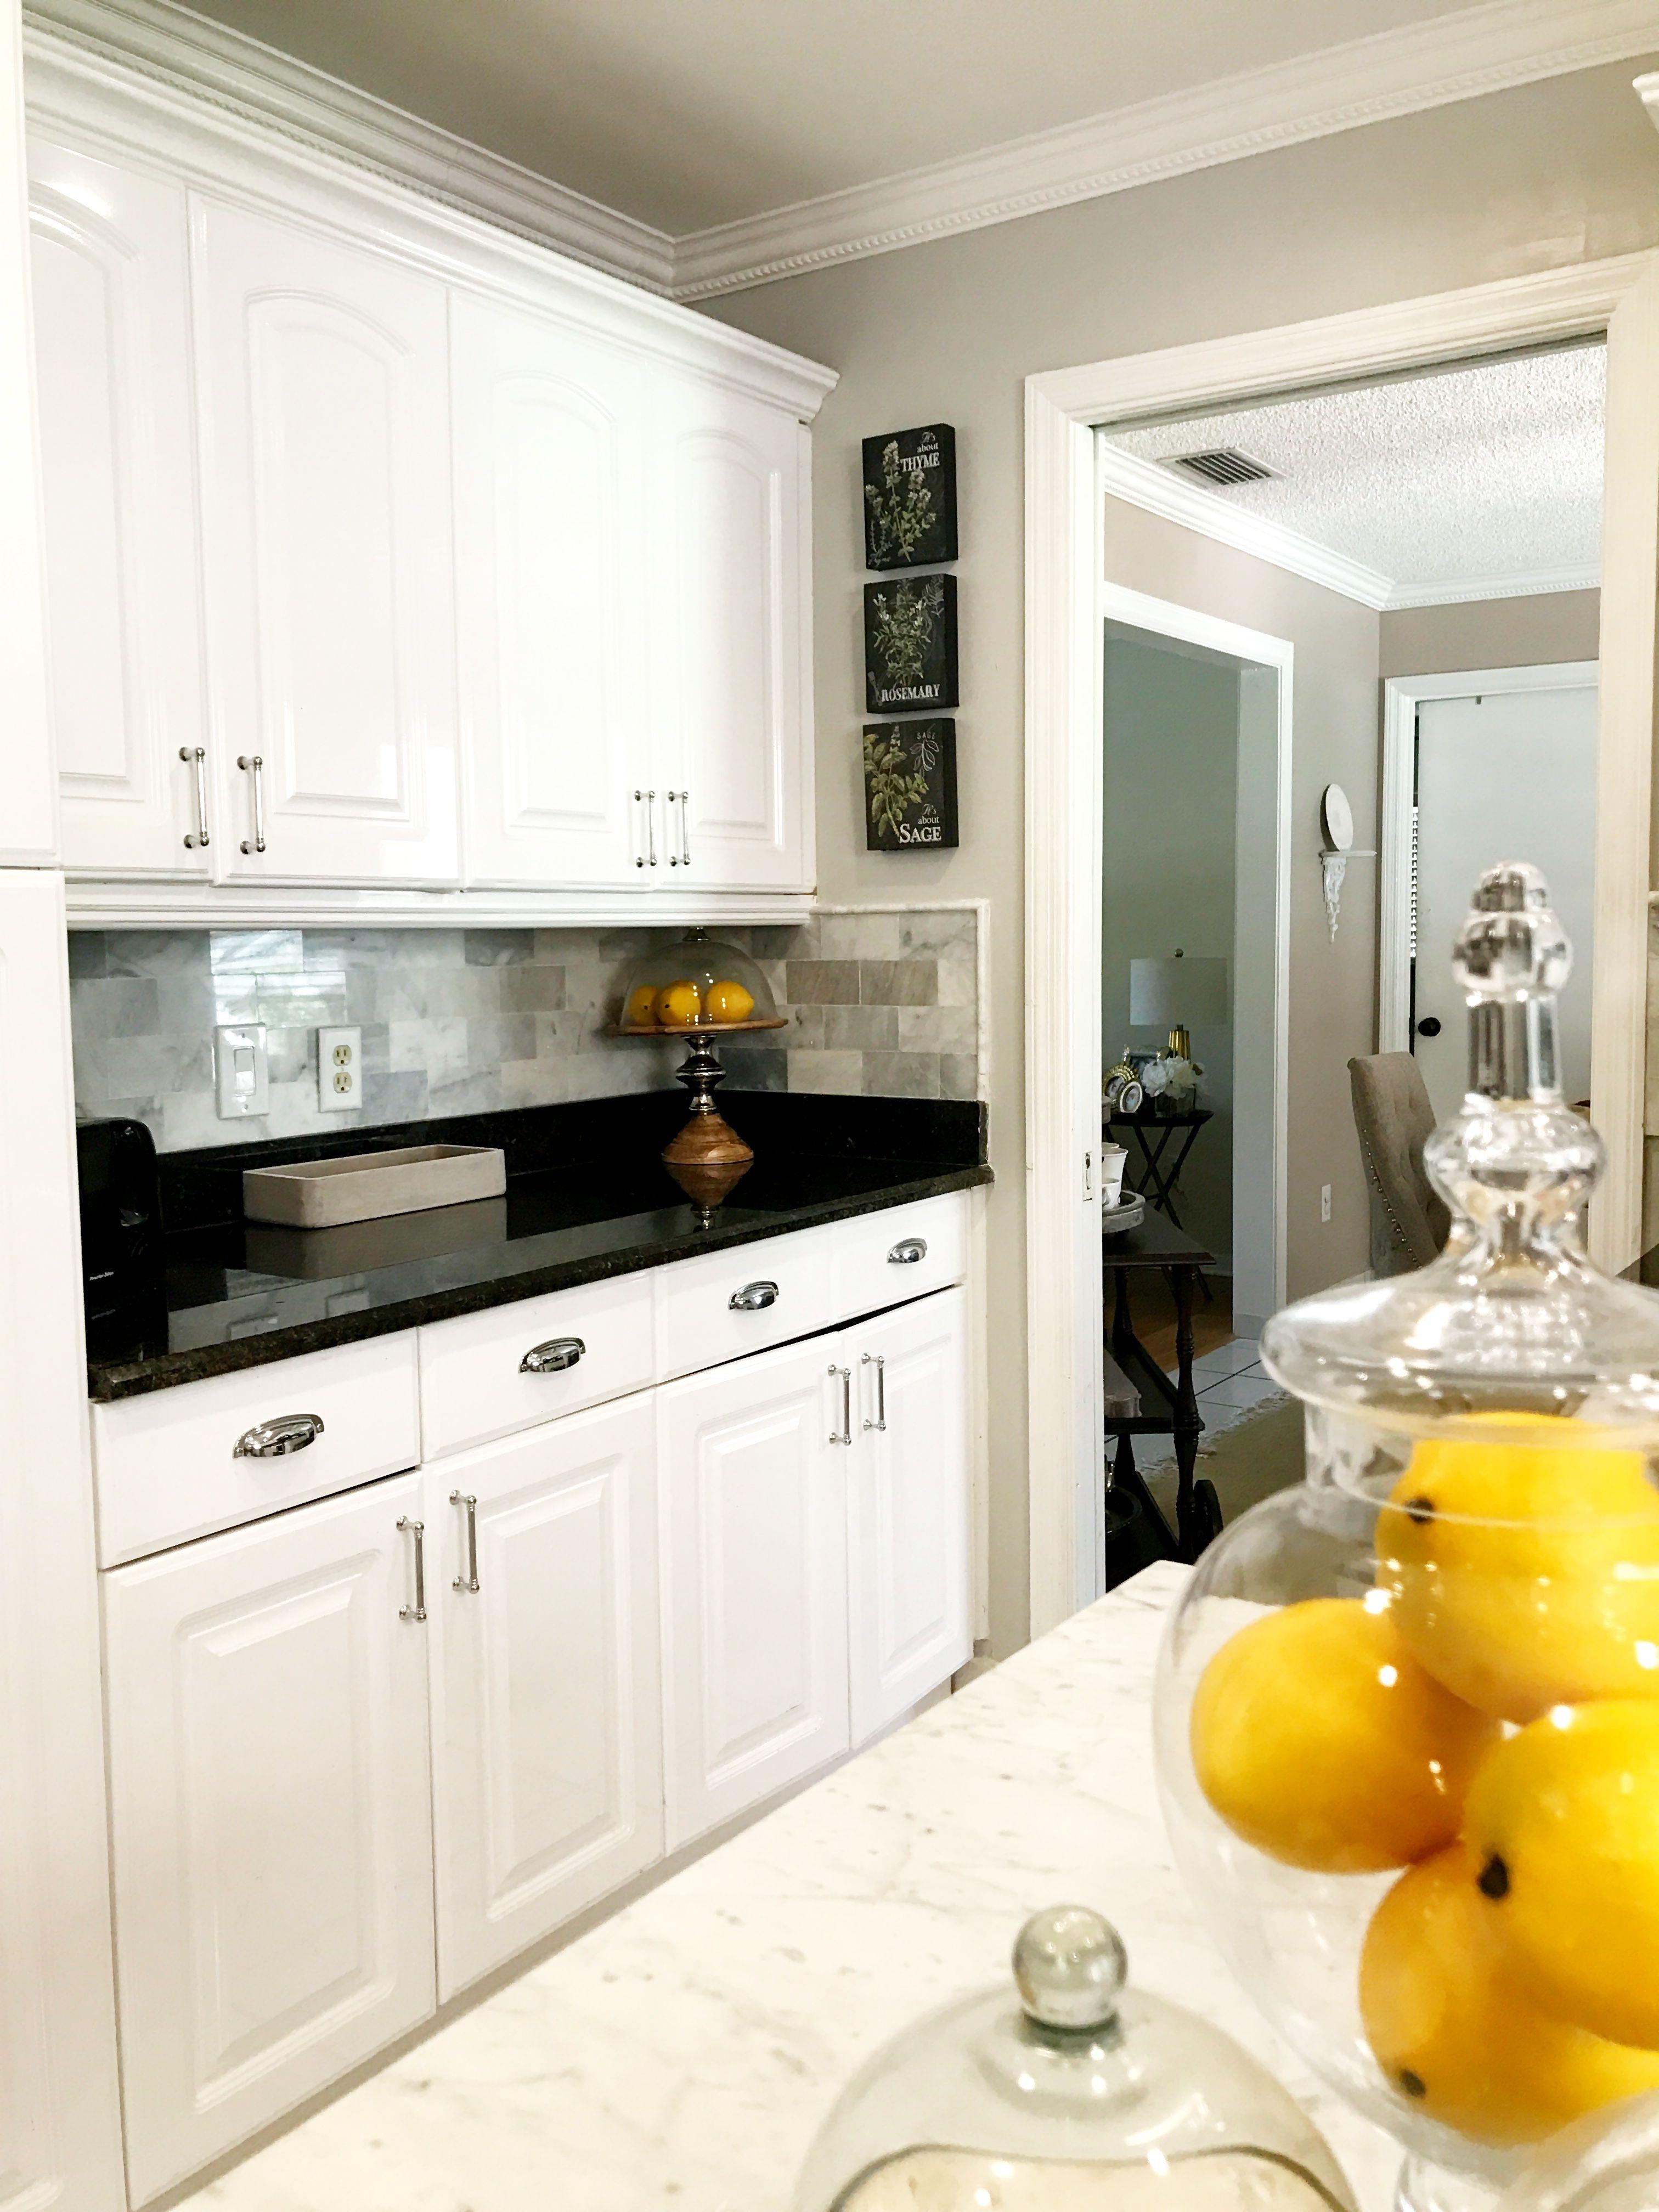 70s home makeover Carrera marble backsplash Repose gray wall paint